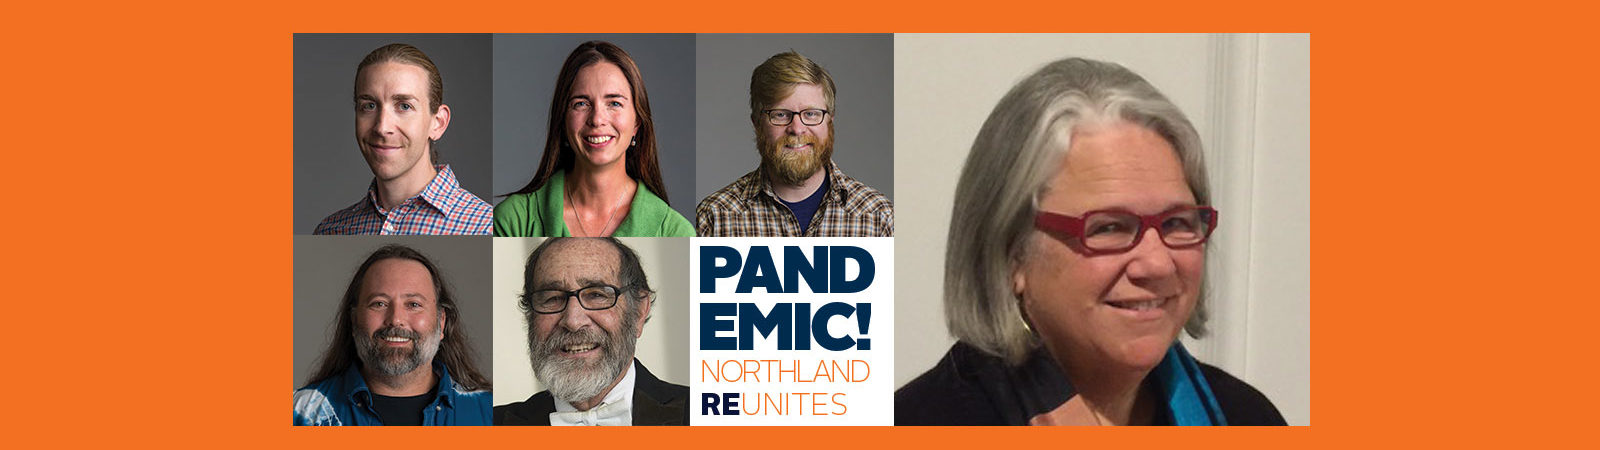 header for event pandemic reunites